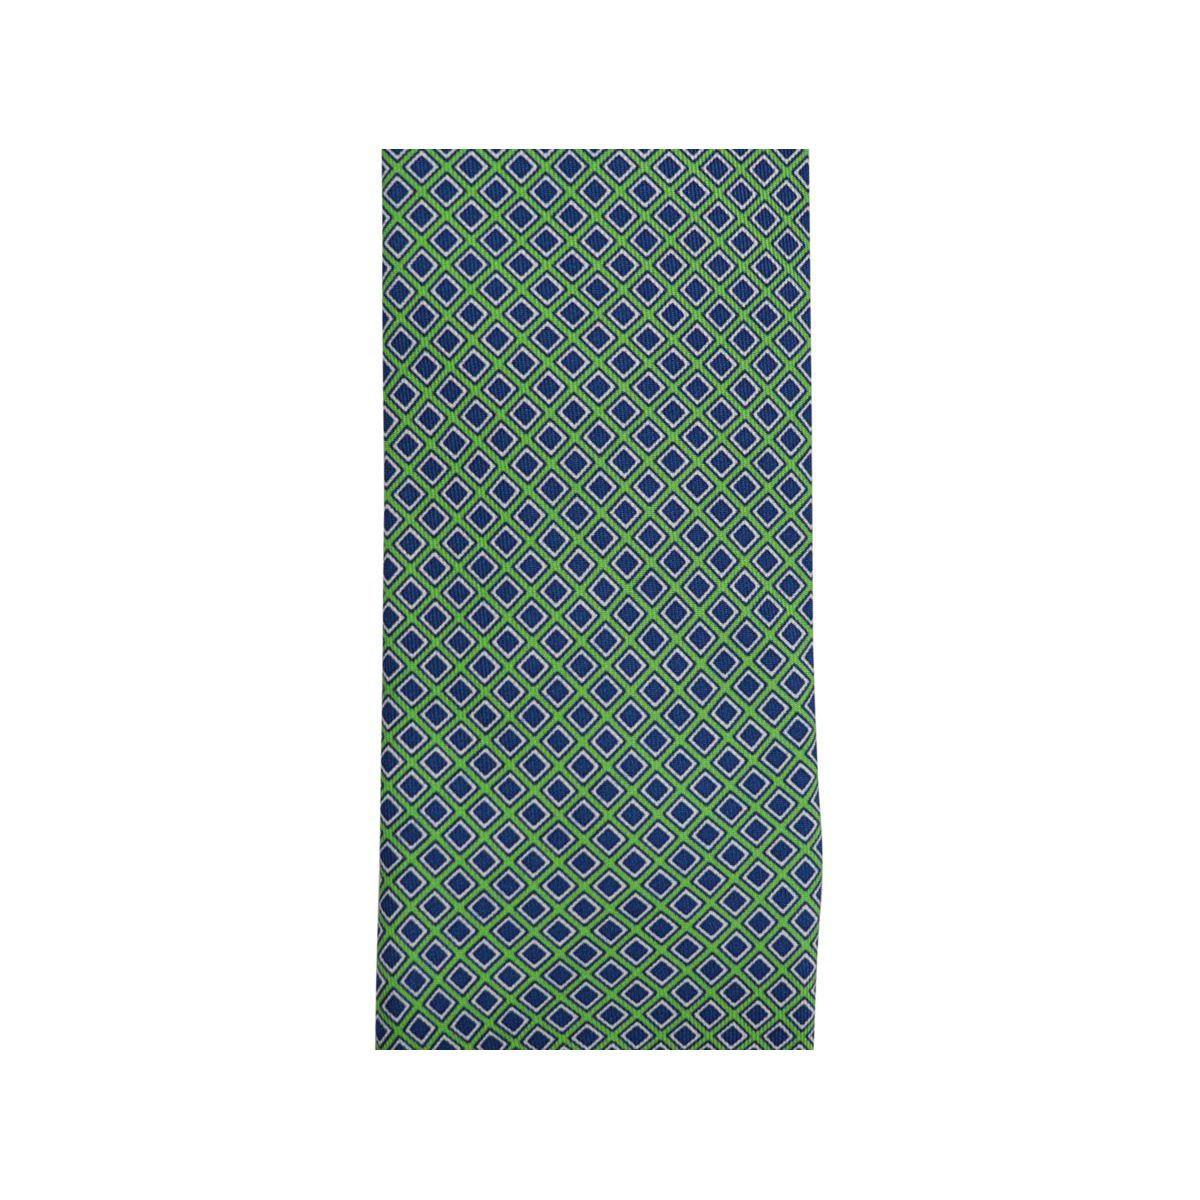 Geometric micro patterned silk tie CM 7 Emerald Church's